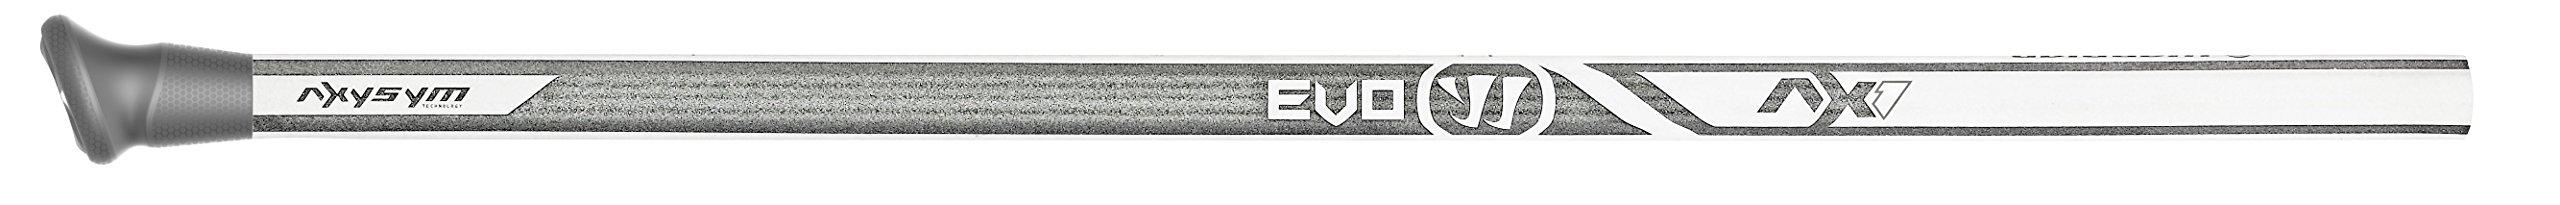 Warrior Evo AX1 Composite Defense Handle Lacrose Shaft, White